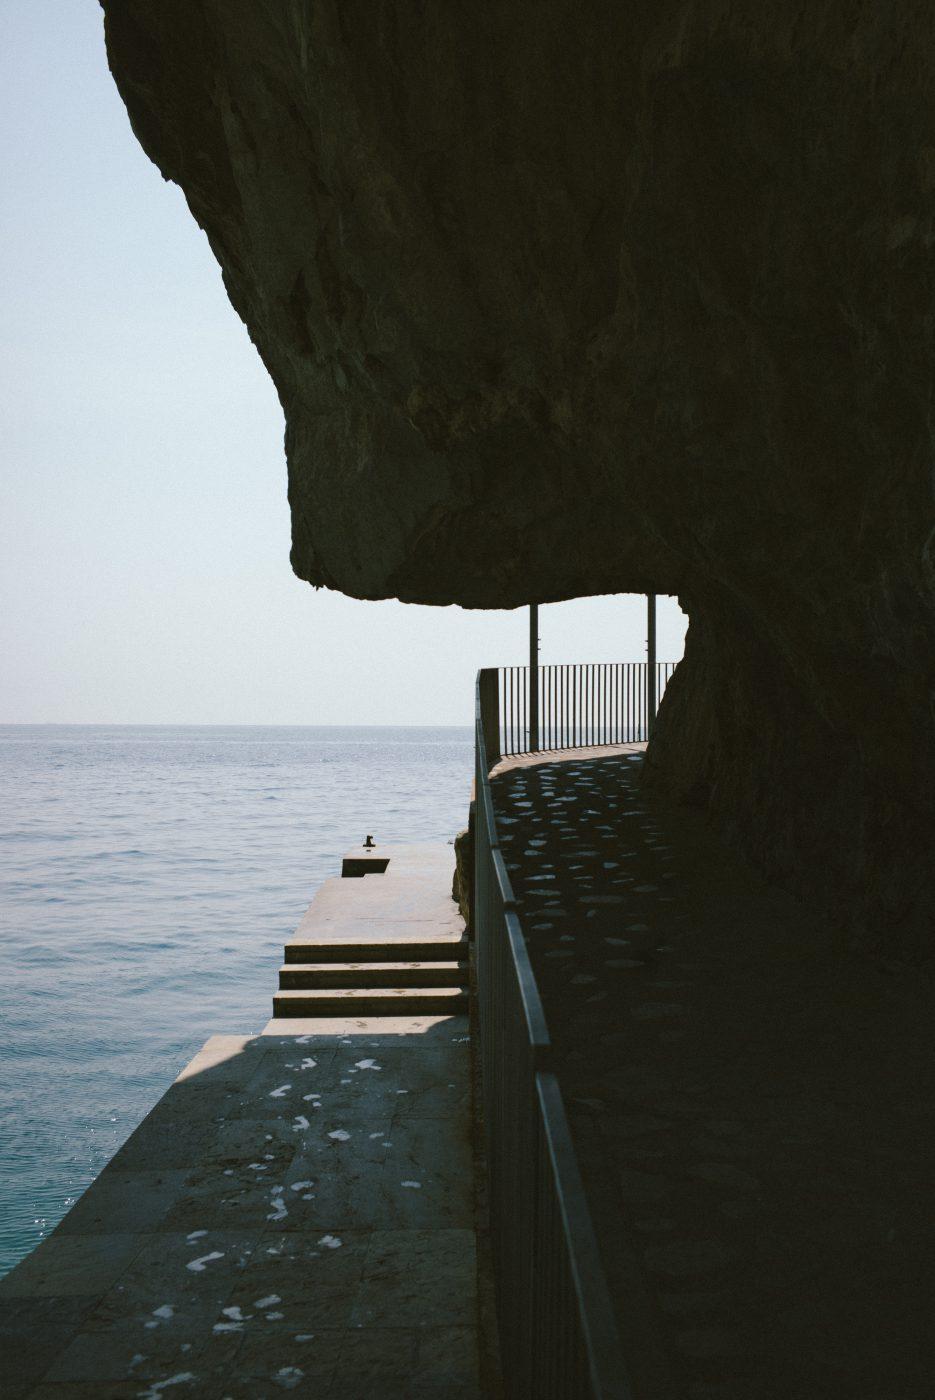 Amalfi visual journey - Raf Maes